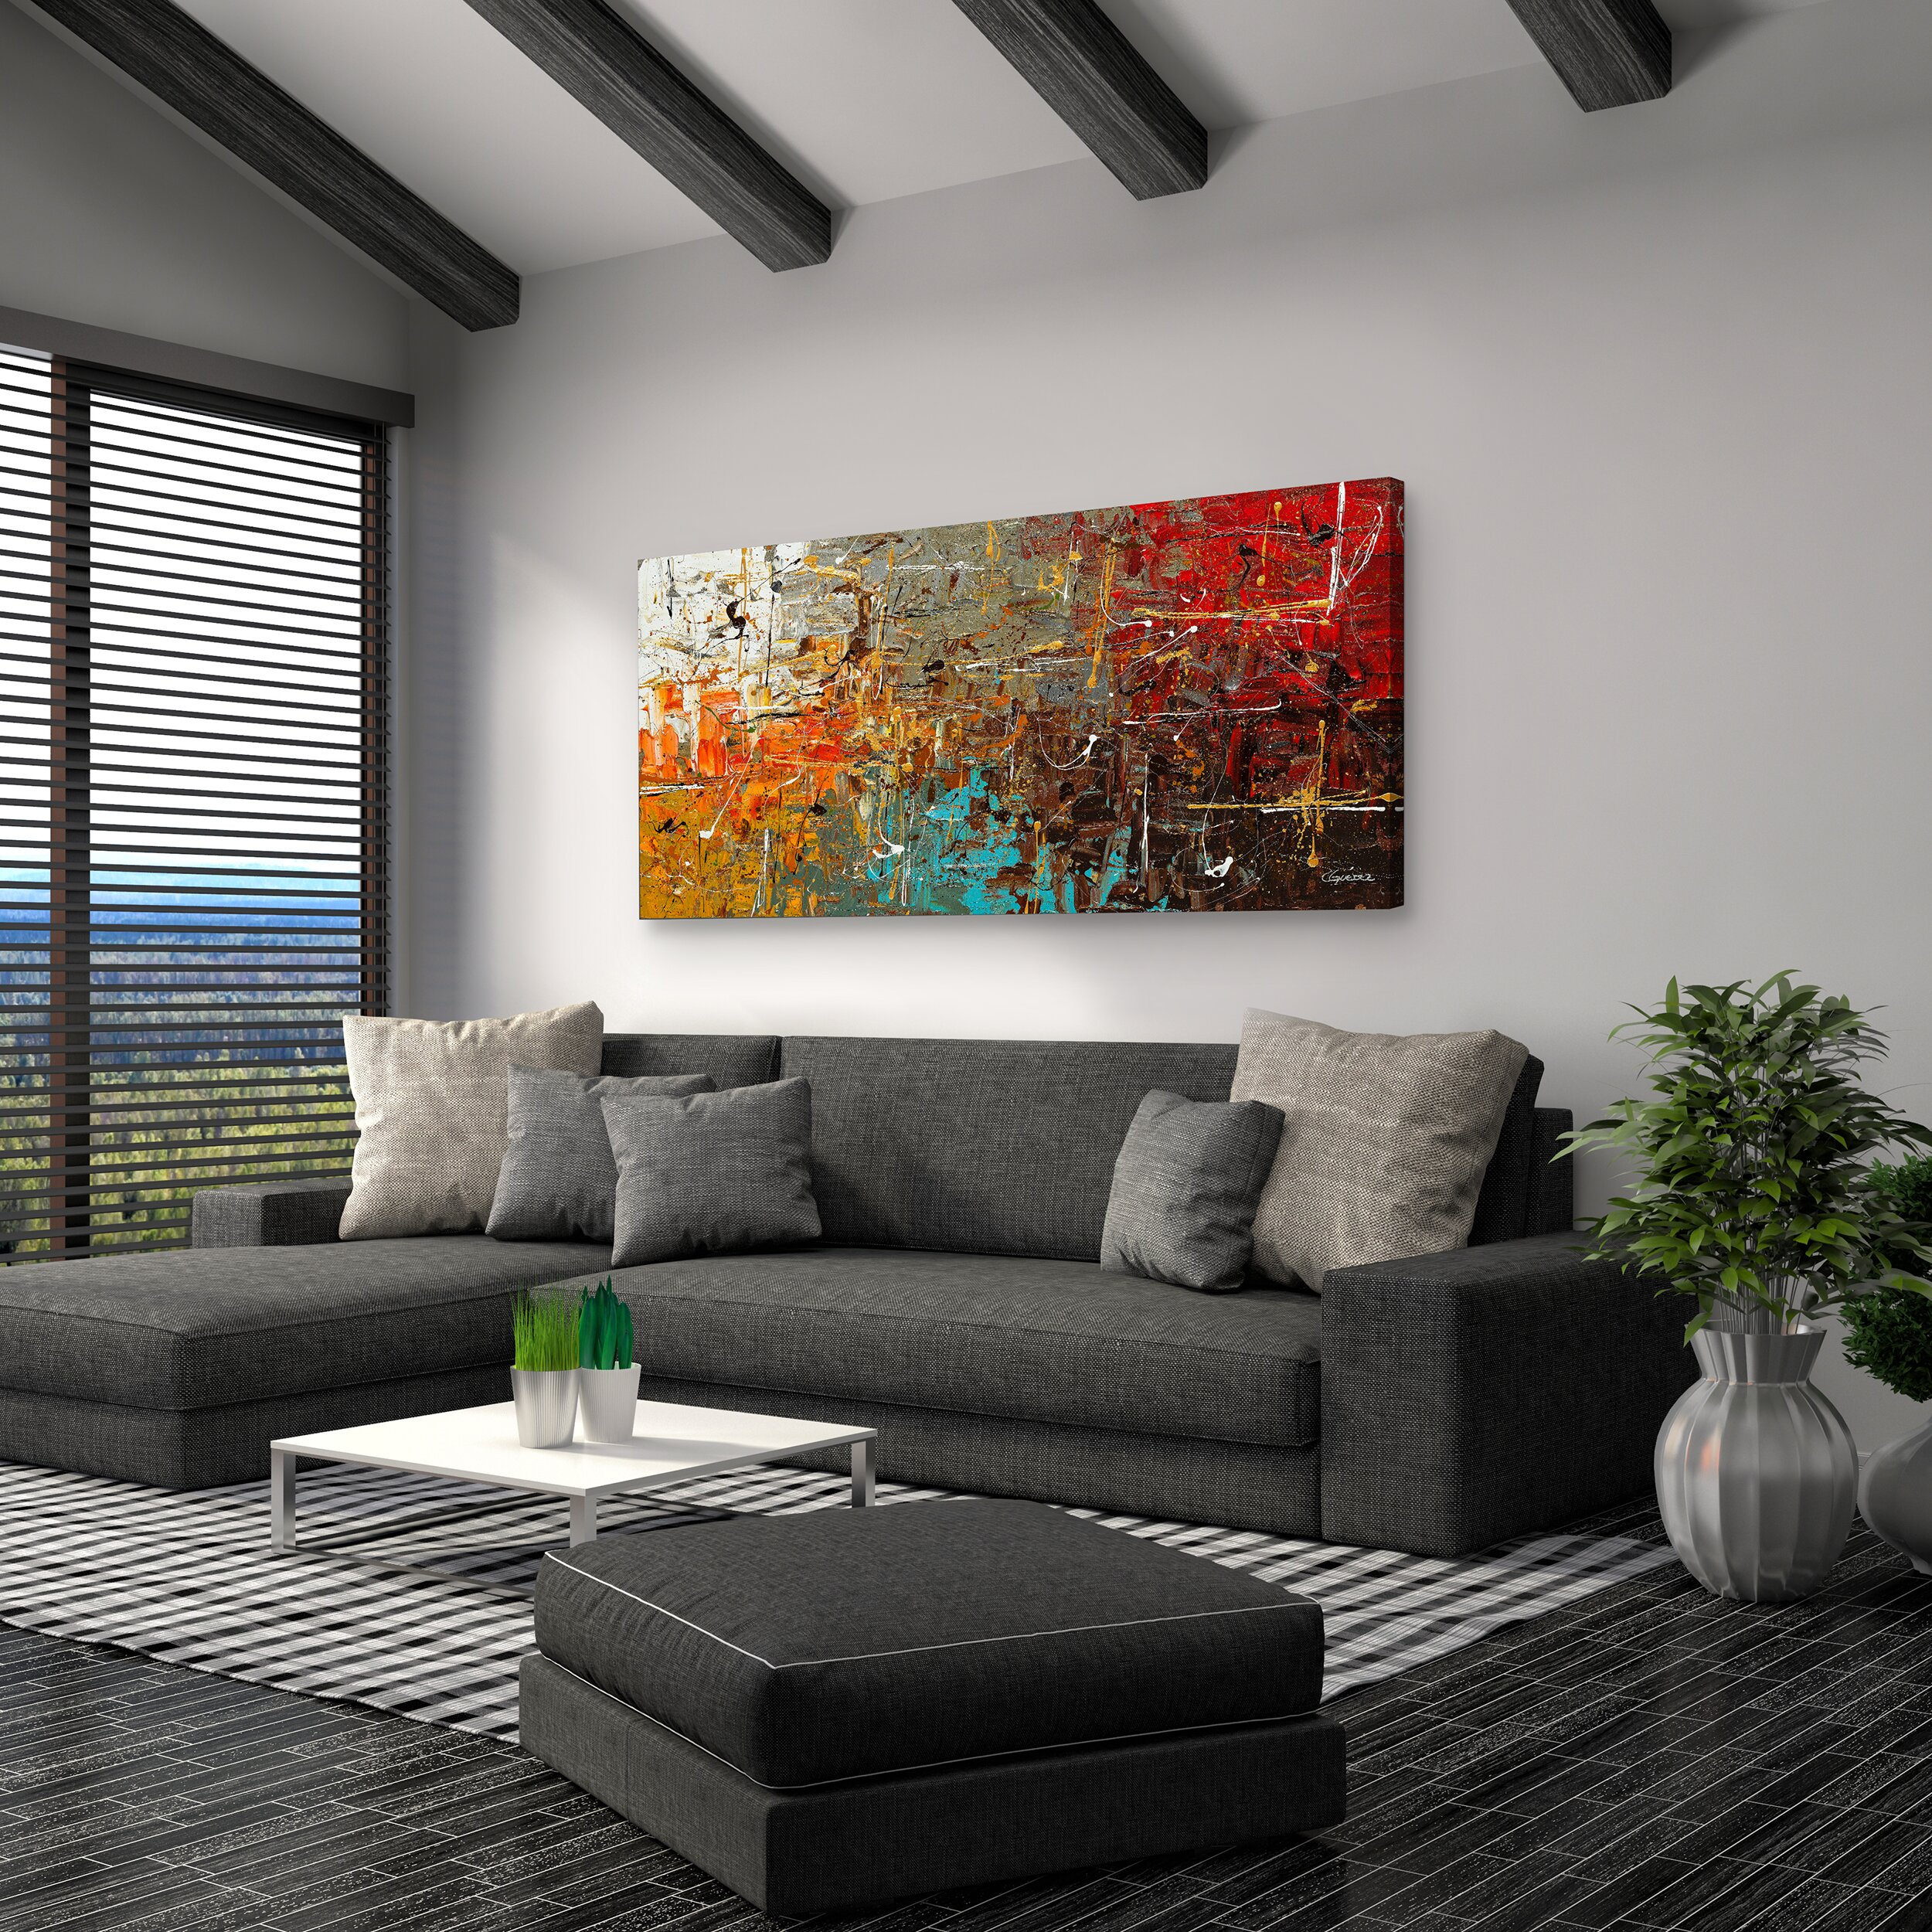 artefx decor safe and sound by carmen guedez painting. Black Bedroom Furniture Sets. Home Design Ideas